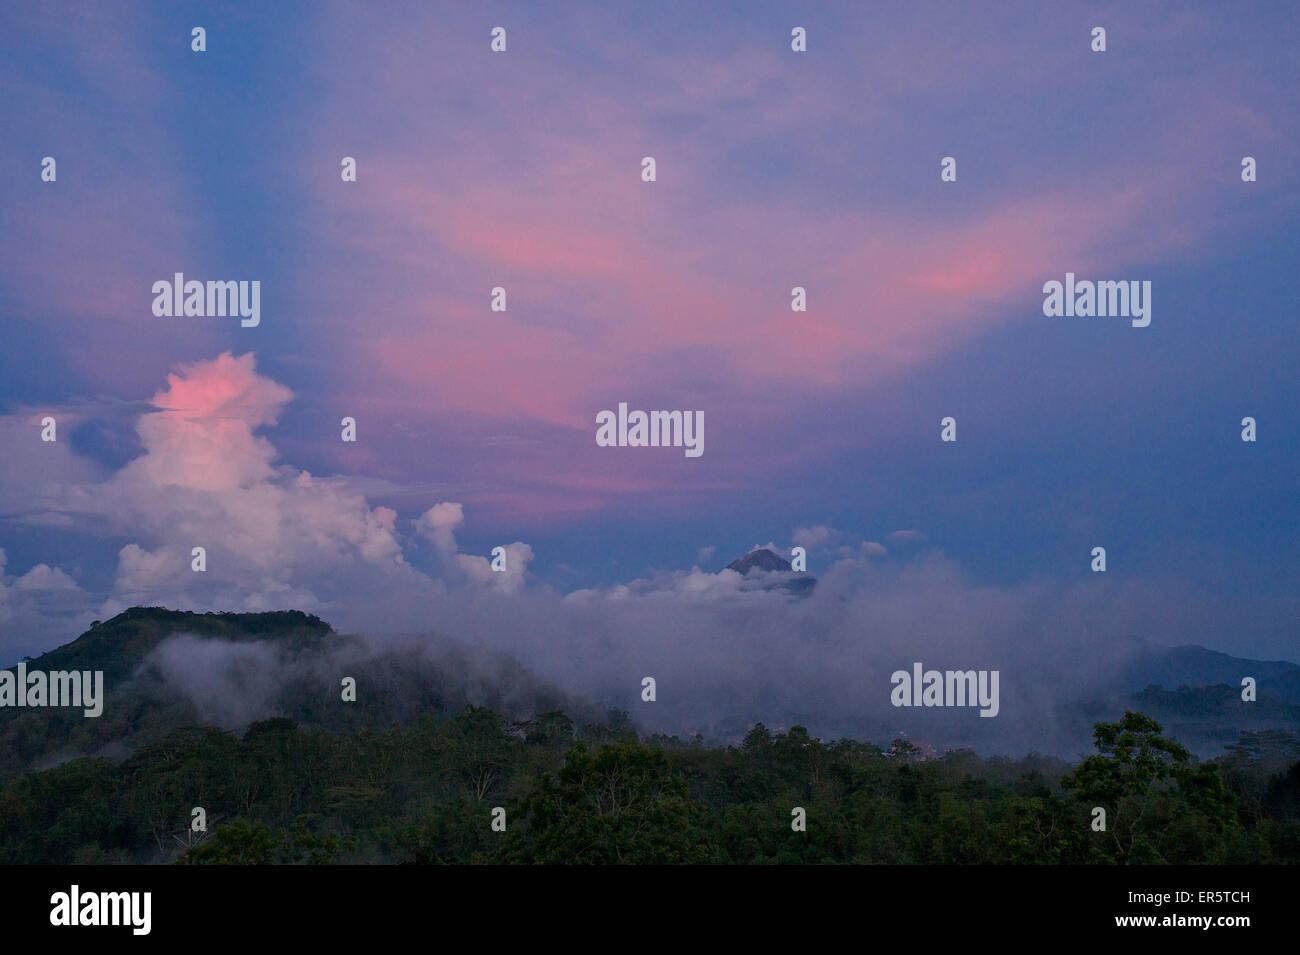 Vulcanos near Bajawa in the evening dawn, Flores, Nusa Tenggara Timur, Lesser Sunda Islands, Indonesia, Asia - Stock Image